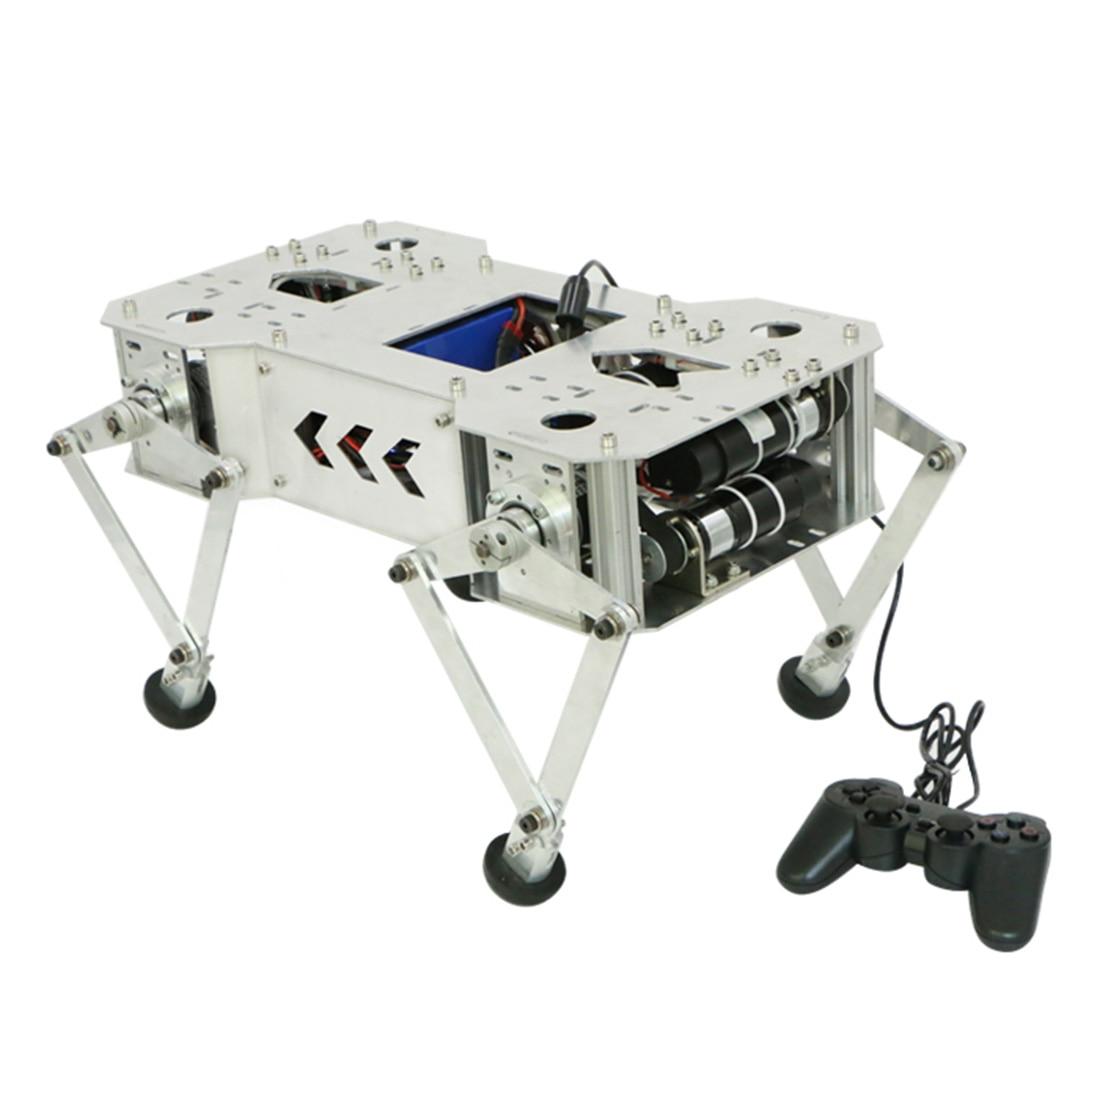 Programmable Metal Mechanical Walking Dog Bionic Quadruped Crawling Smart Robot Toy